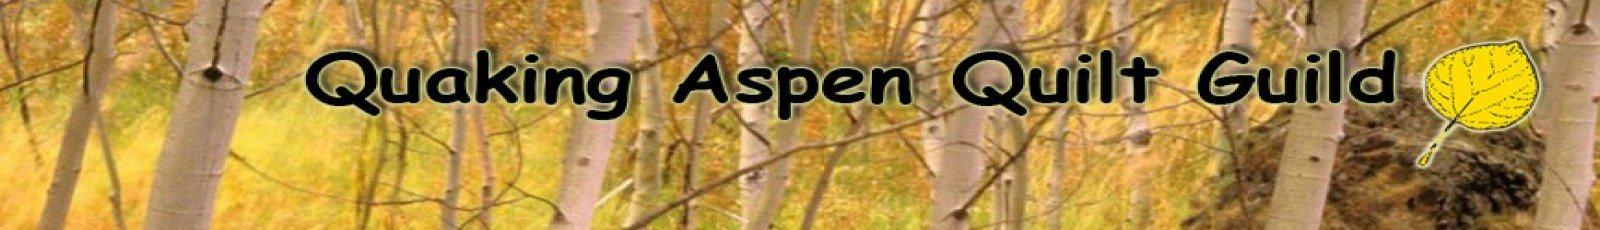 Quaking Aspen Quilt Guild – Boulder, Colorado